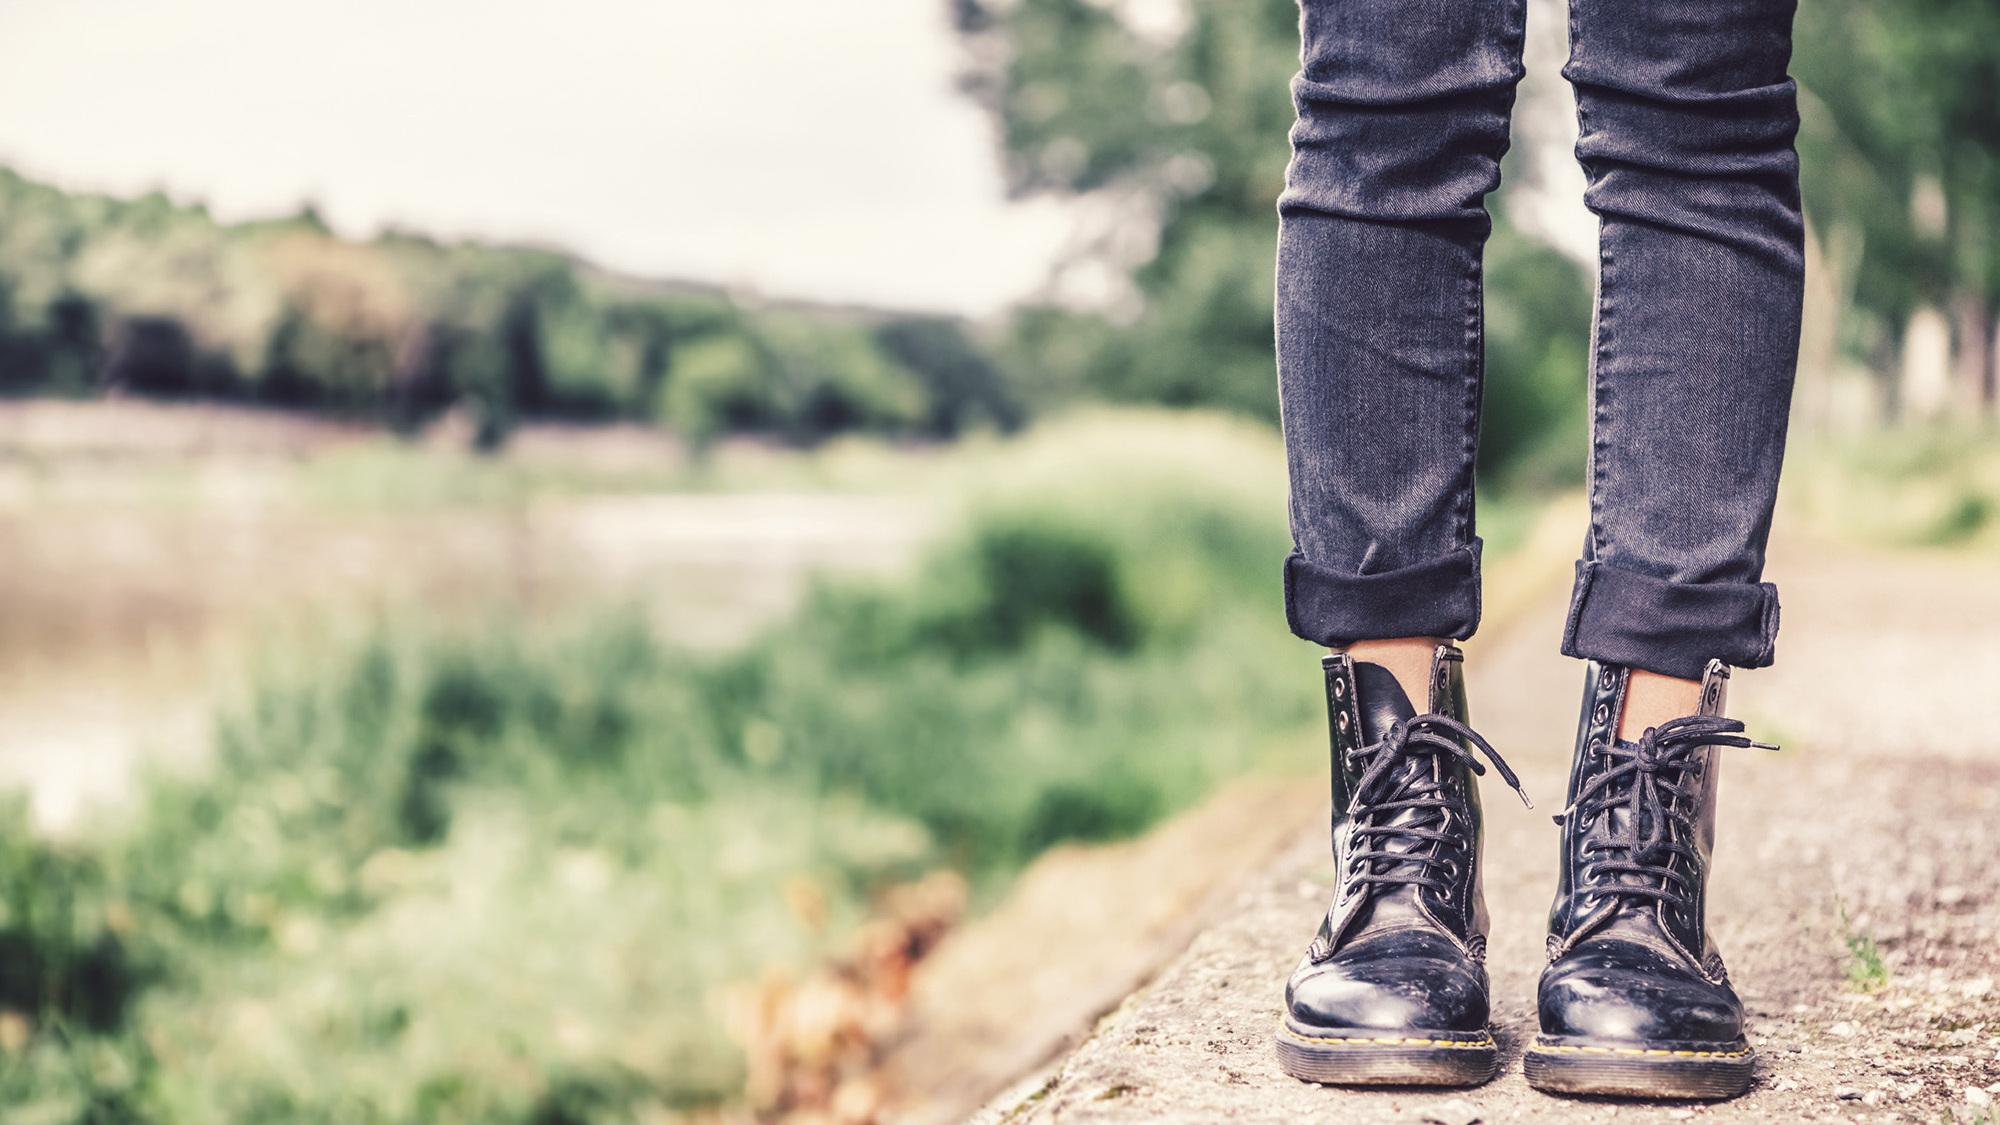 Woman in skinny jeans hospitalized